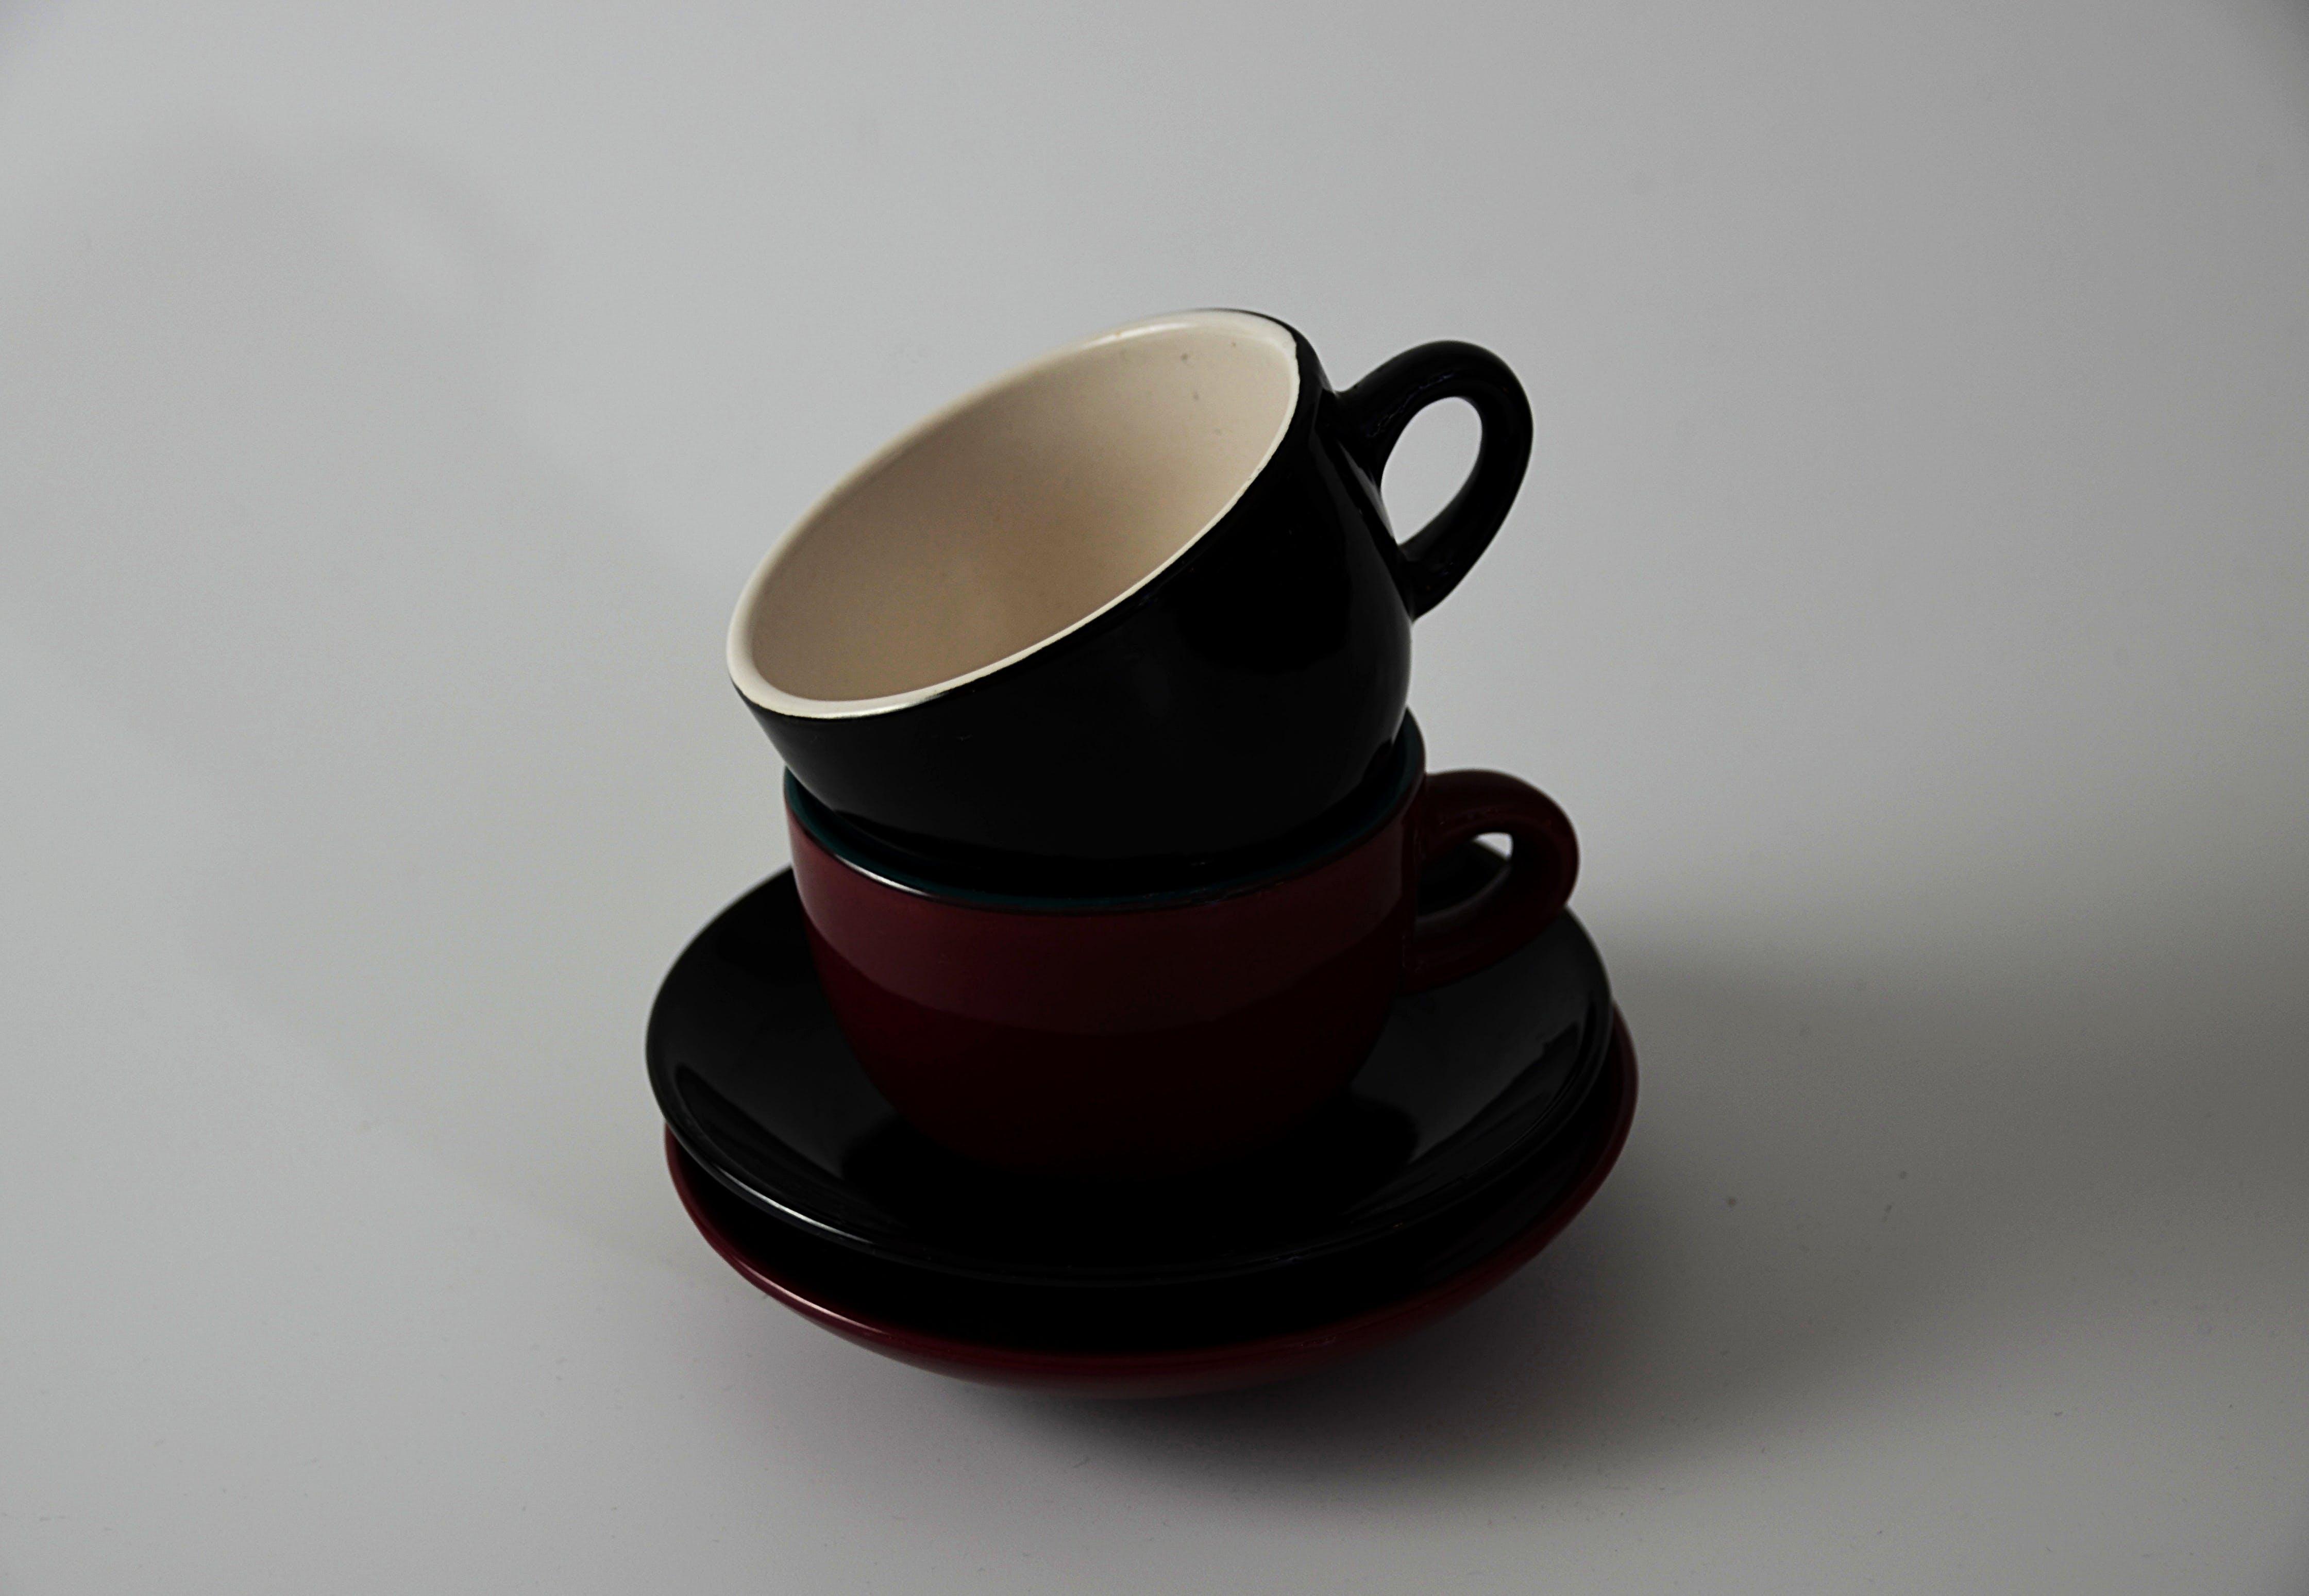 Red and Black Ceramic Mugs